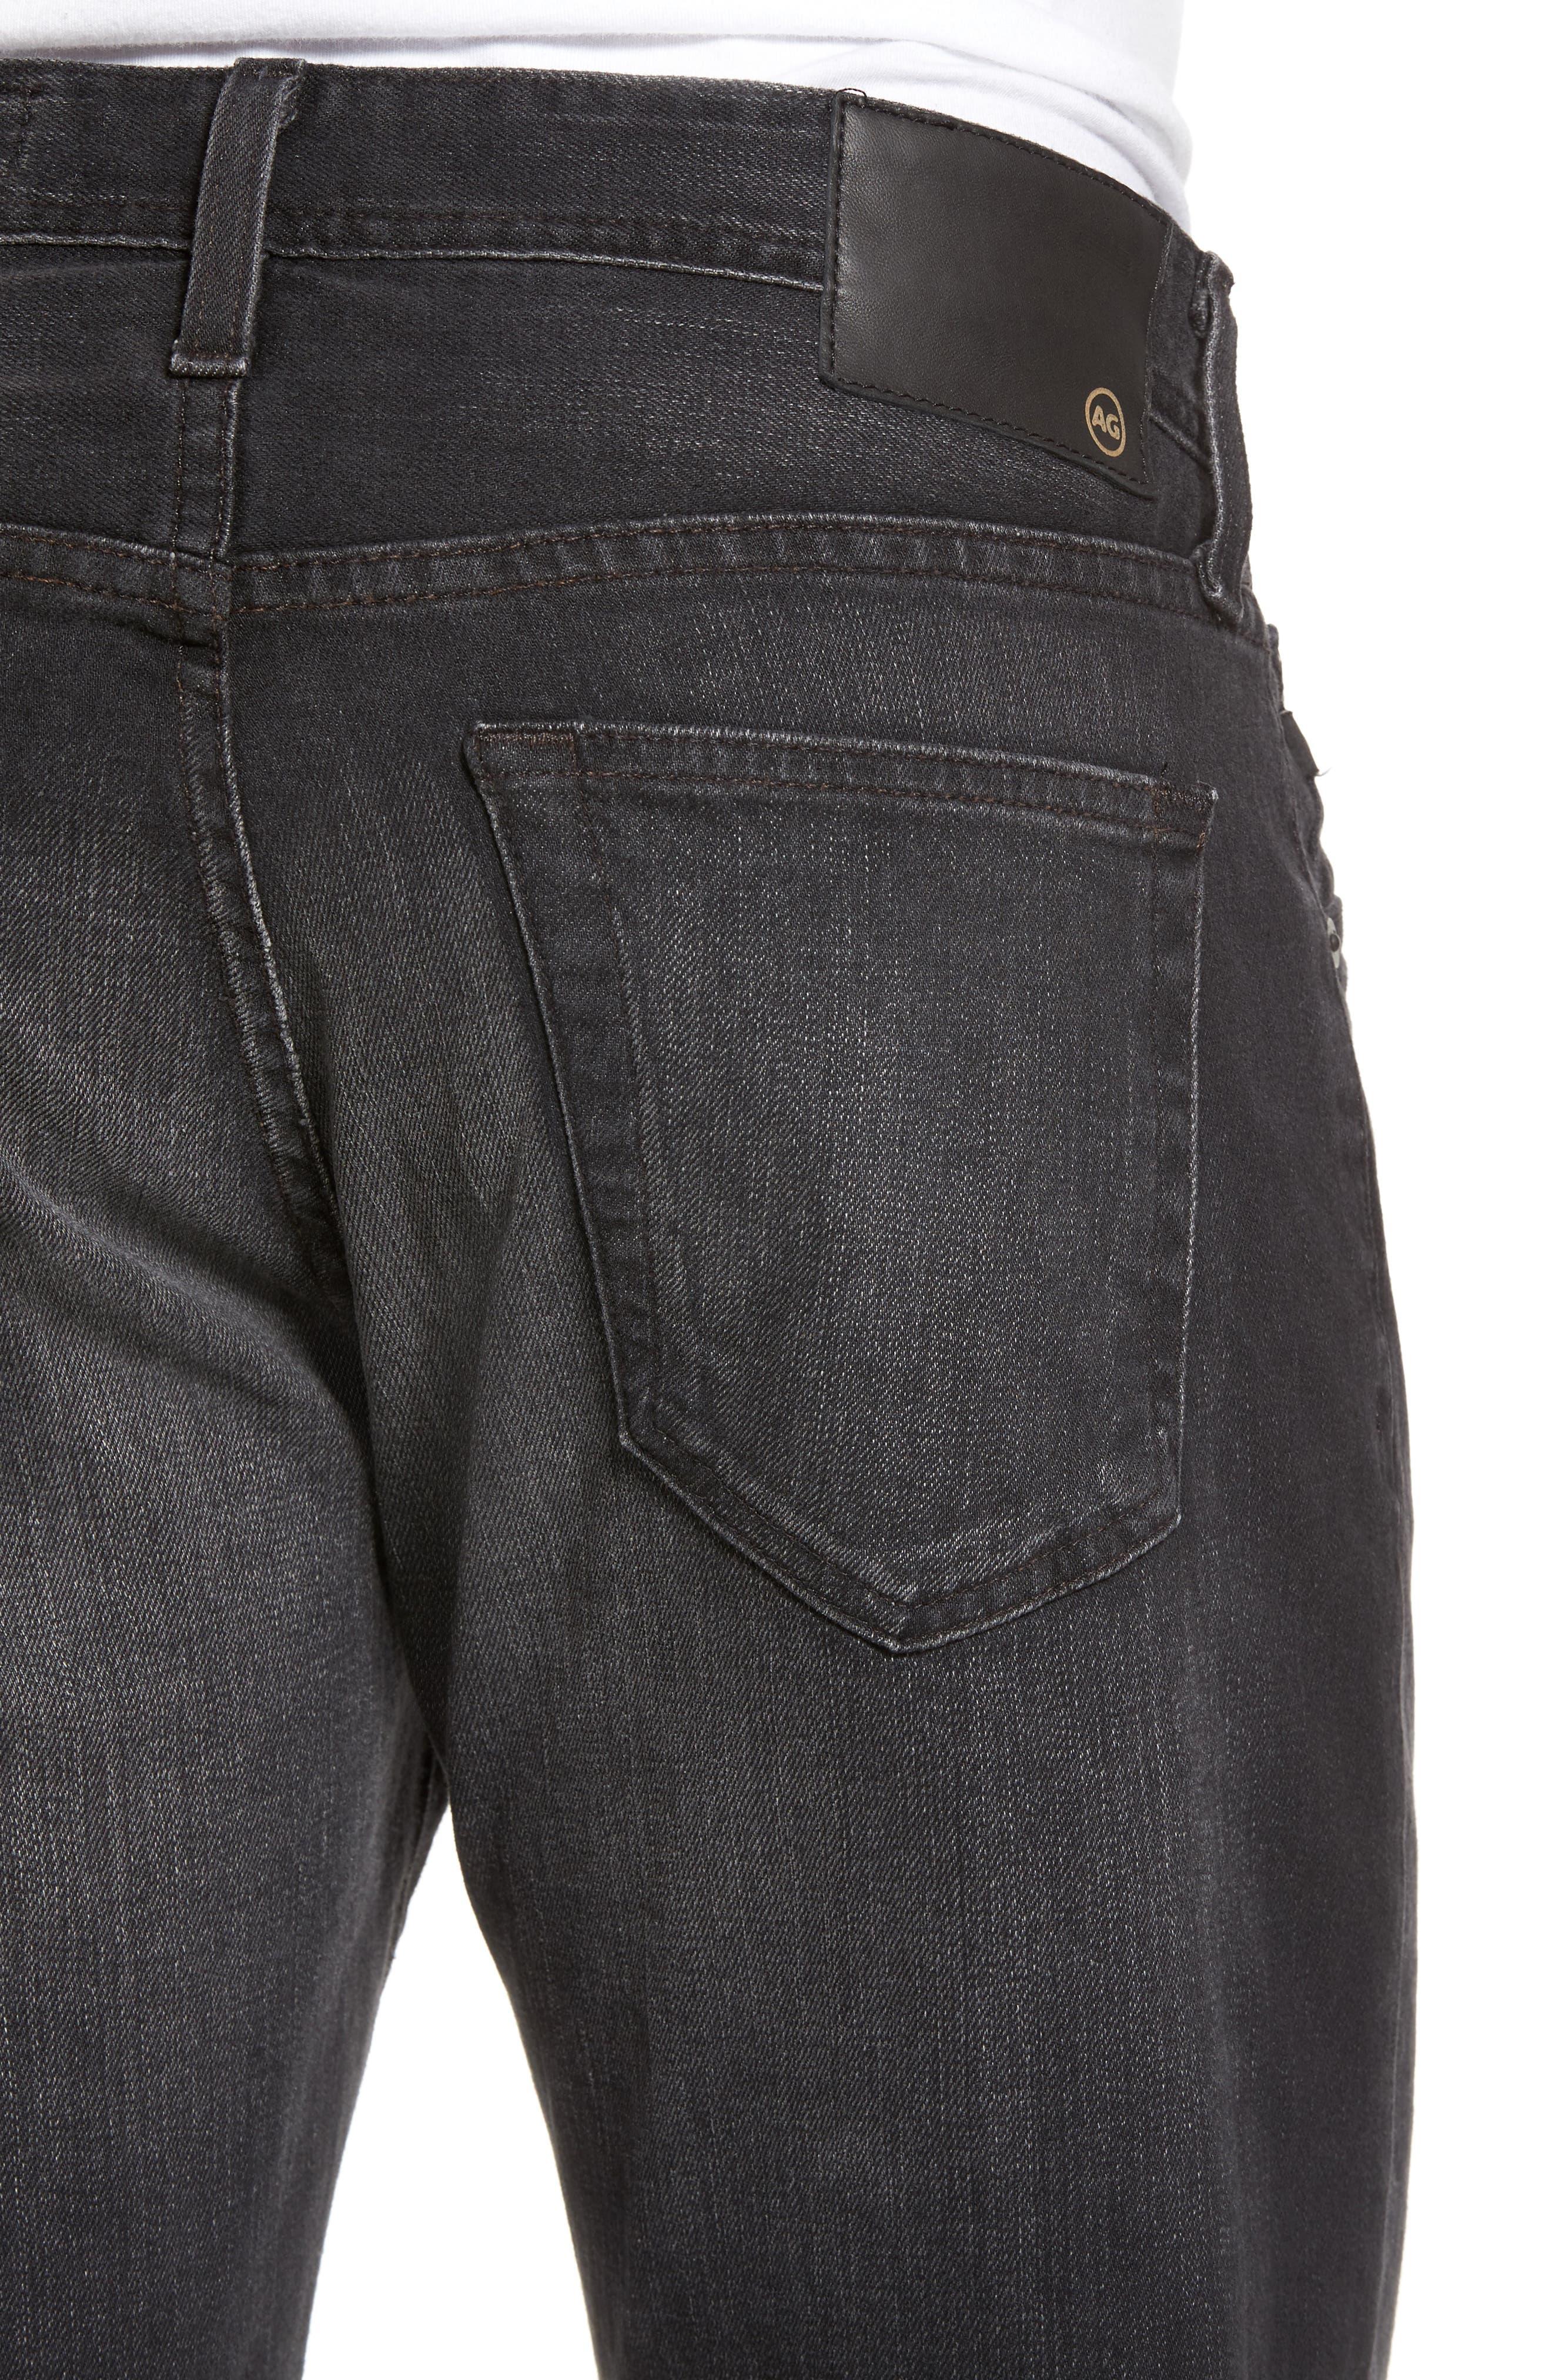 Tellis Modern Slim Fit Jeans,                             Alternate thumbnail 4, color,                             019